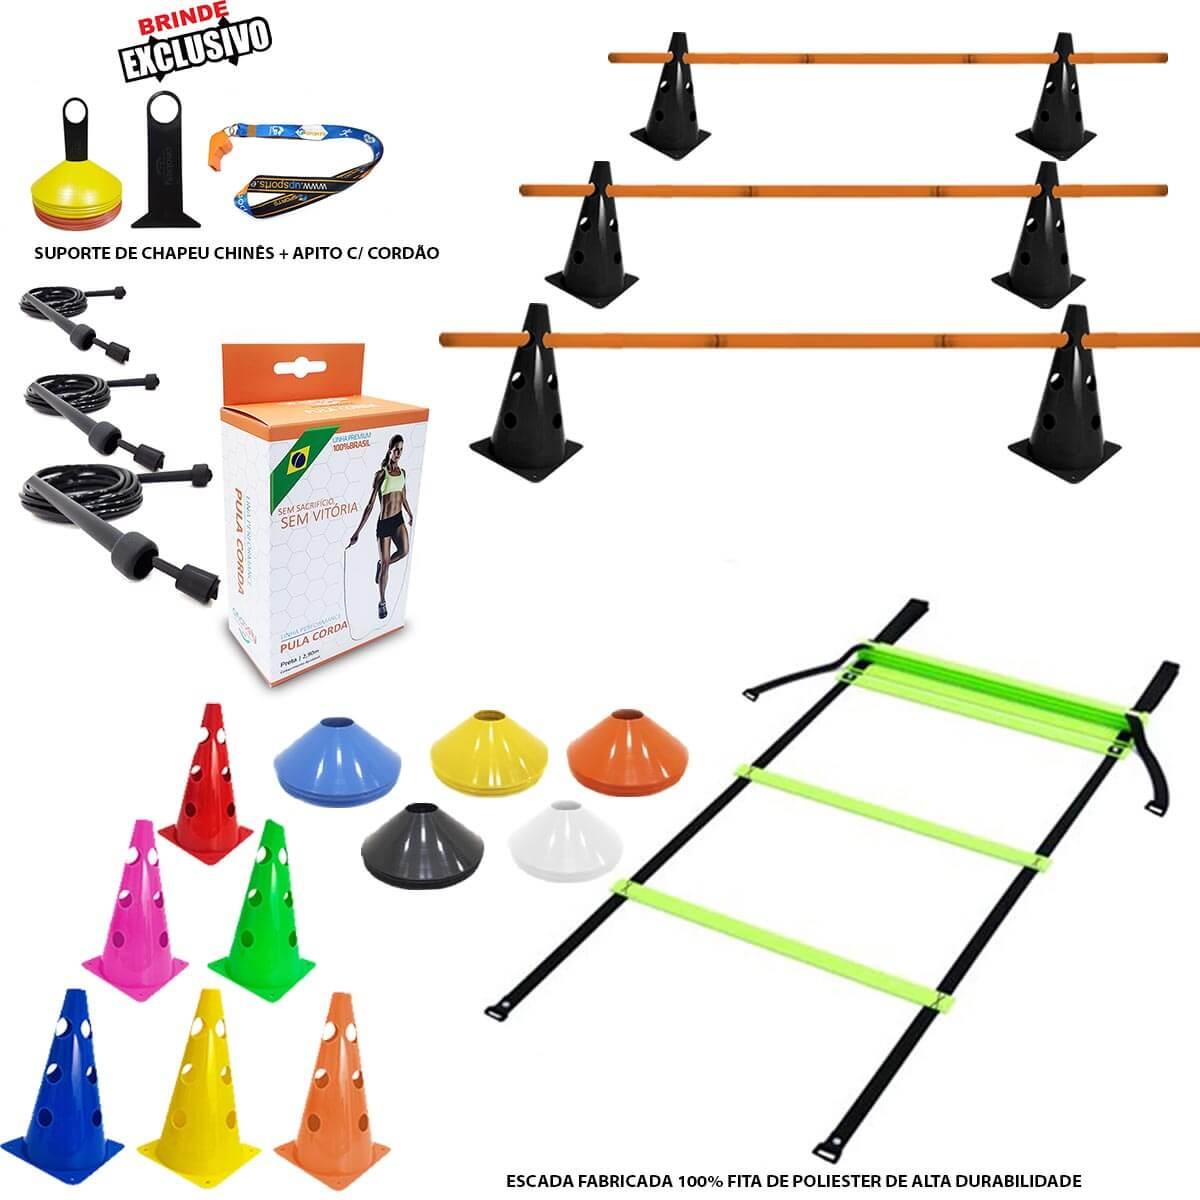 10 Cones c/ Barreira +10 Pratos + Escada Agilidade +3 Cordas